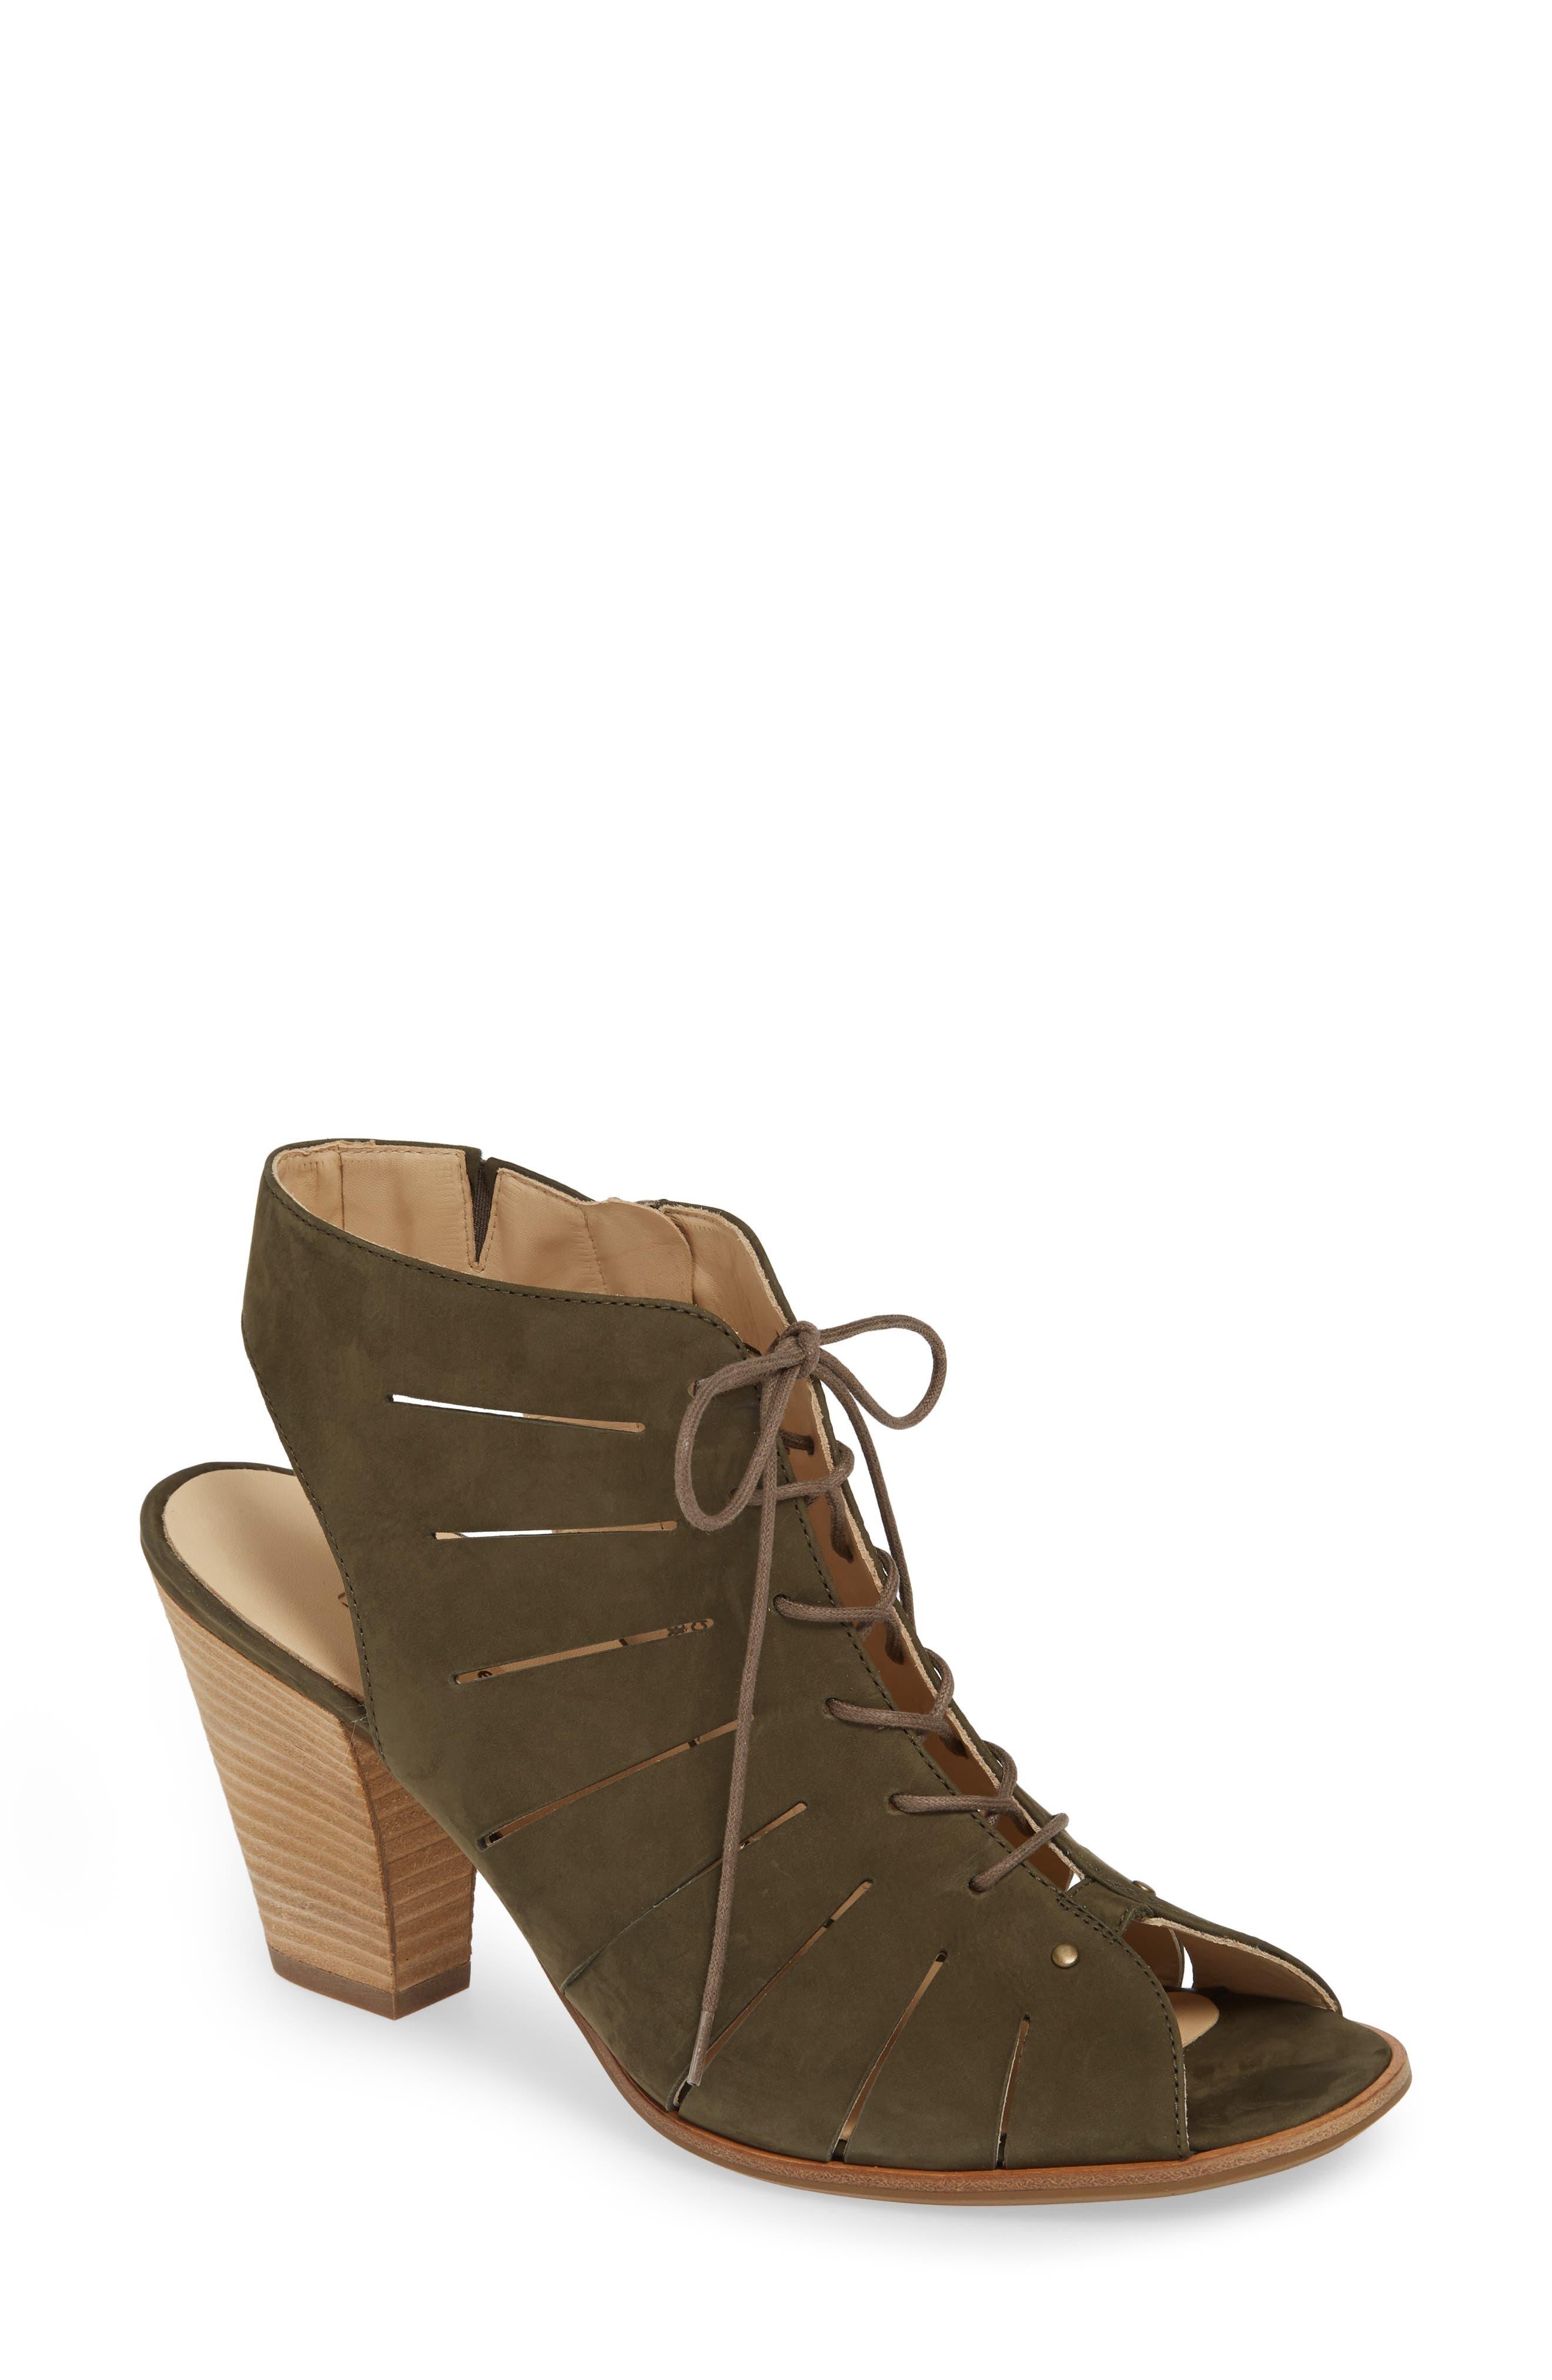 1bc7953110f1 Women s Paul Green Shoes